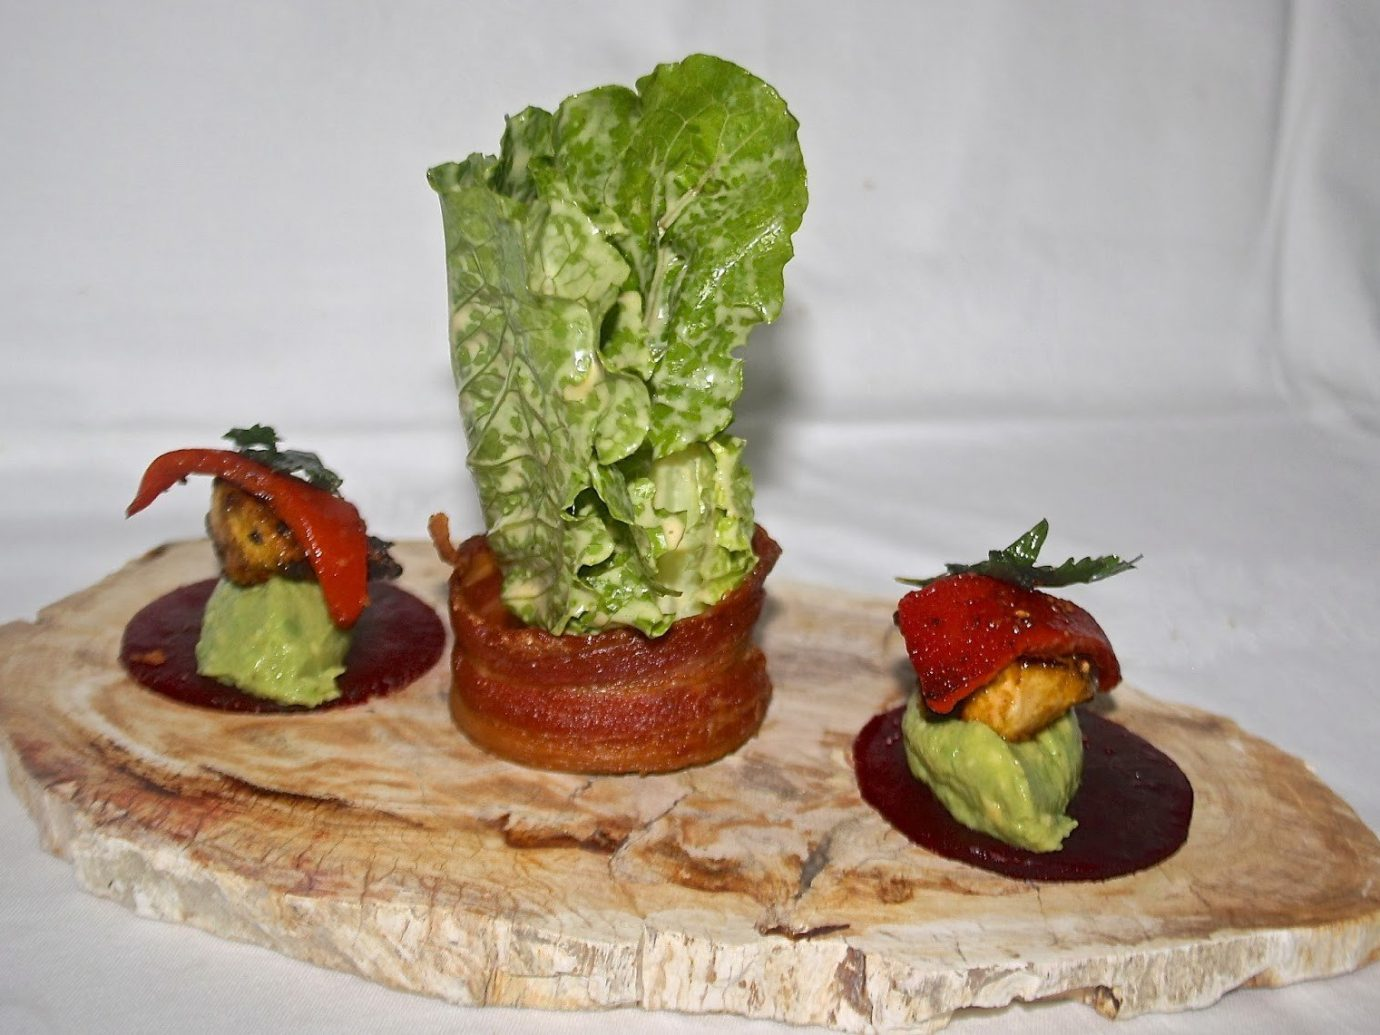 Food + Drink Trip Ideas food piece vegetable slice flowerpot leaf vegetable finger food dish sliced snack food fresh